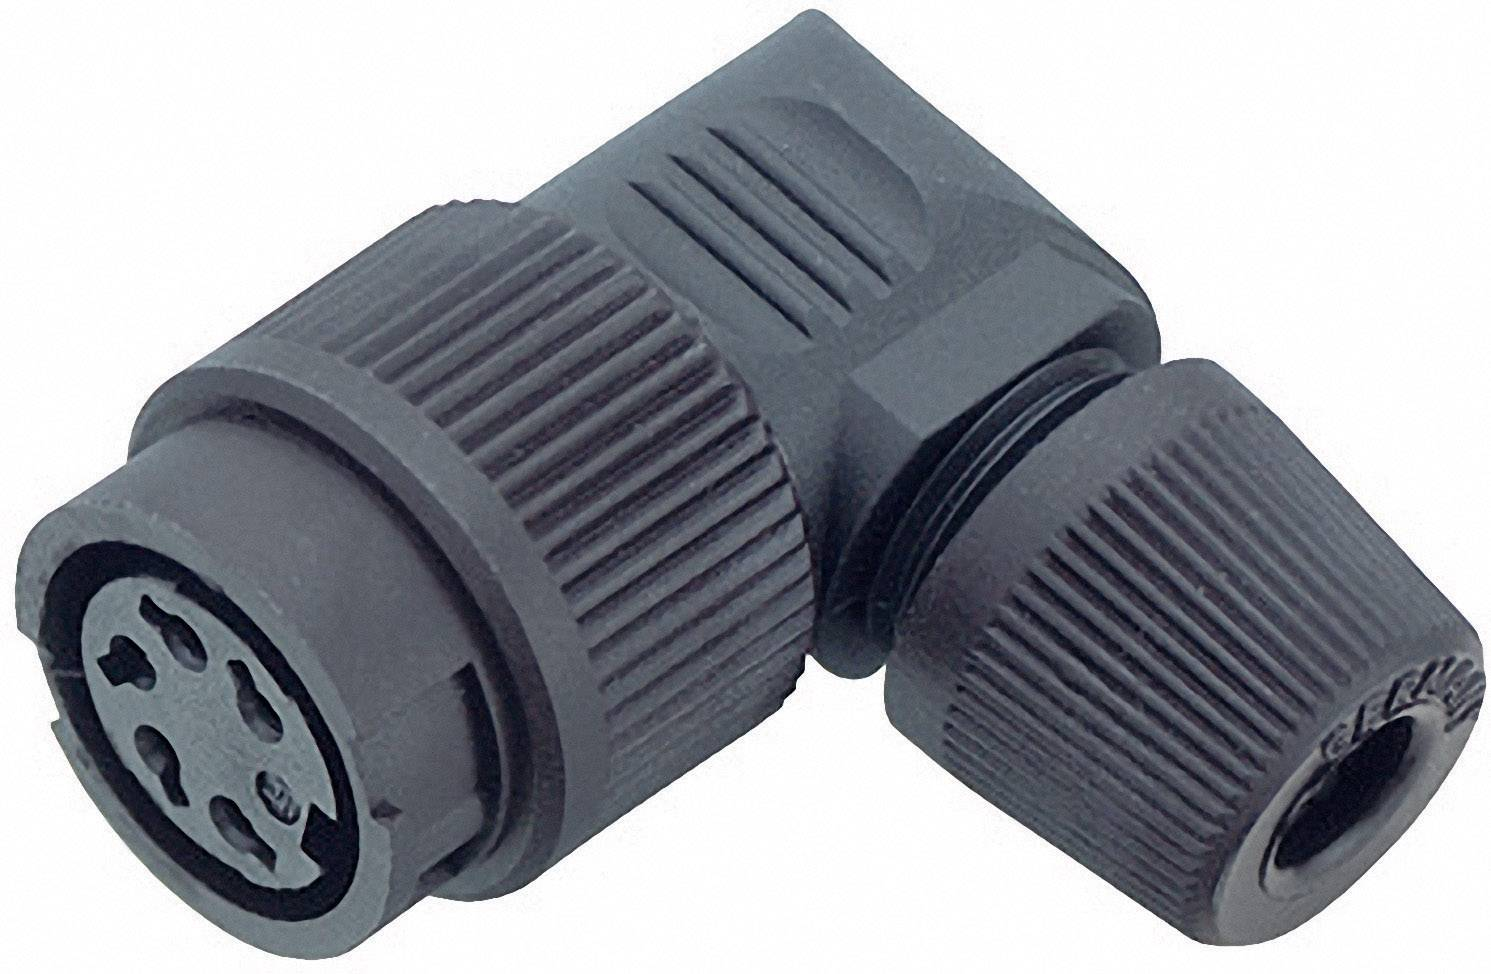 Kabelový konektor Binder 99-0614-70-05, 5pól., 0.75 mm², 4 - 6 mm, IP40, černá